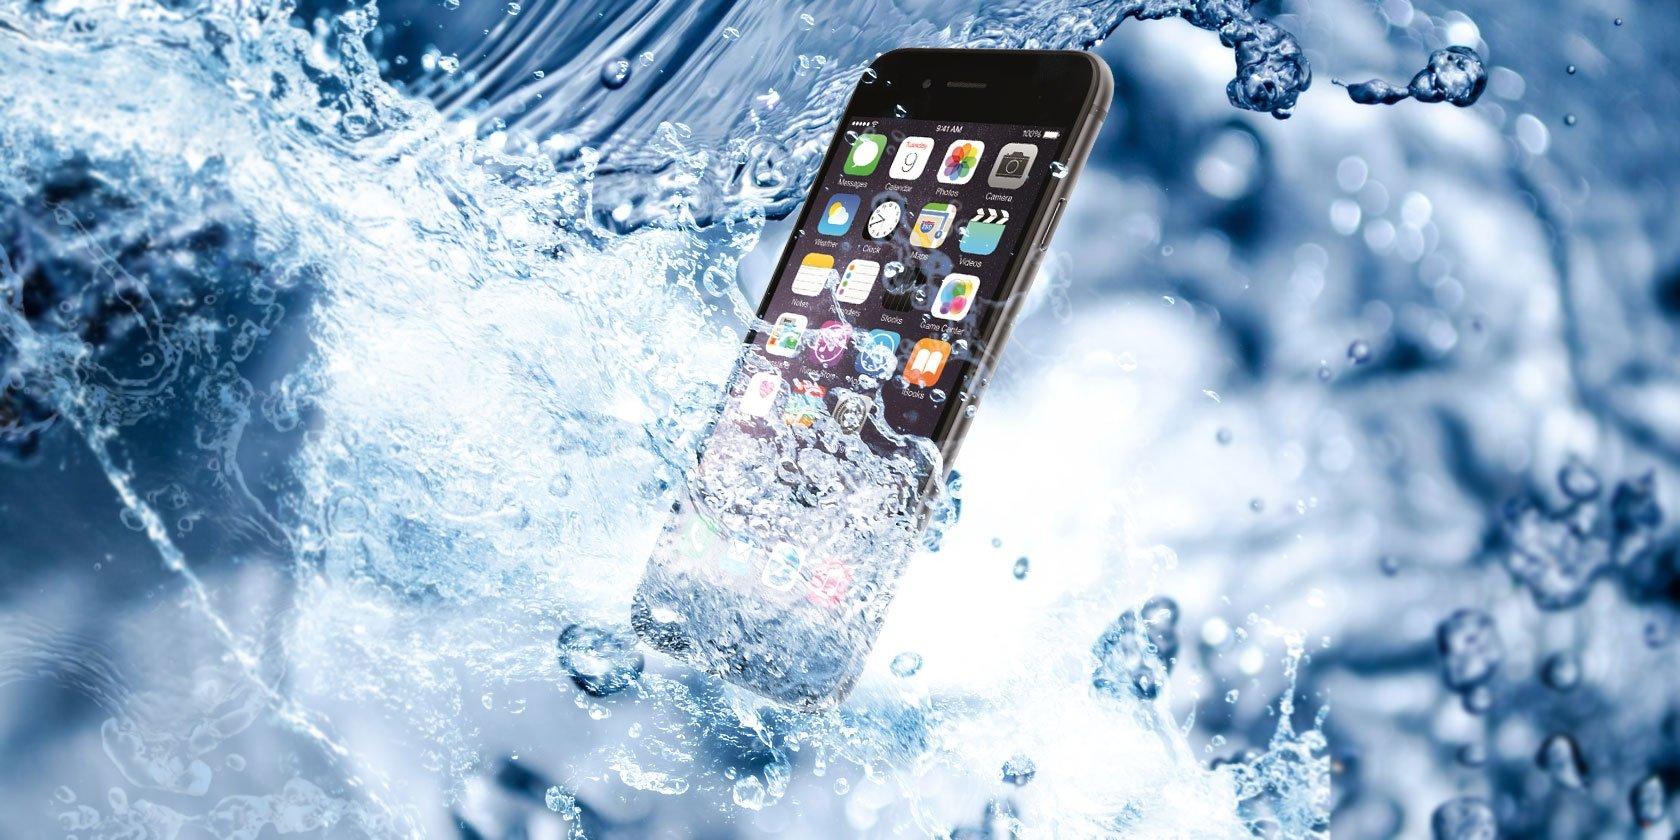 iPhone com água